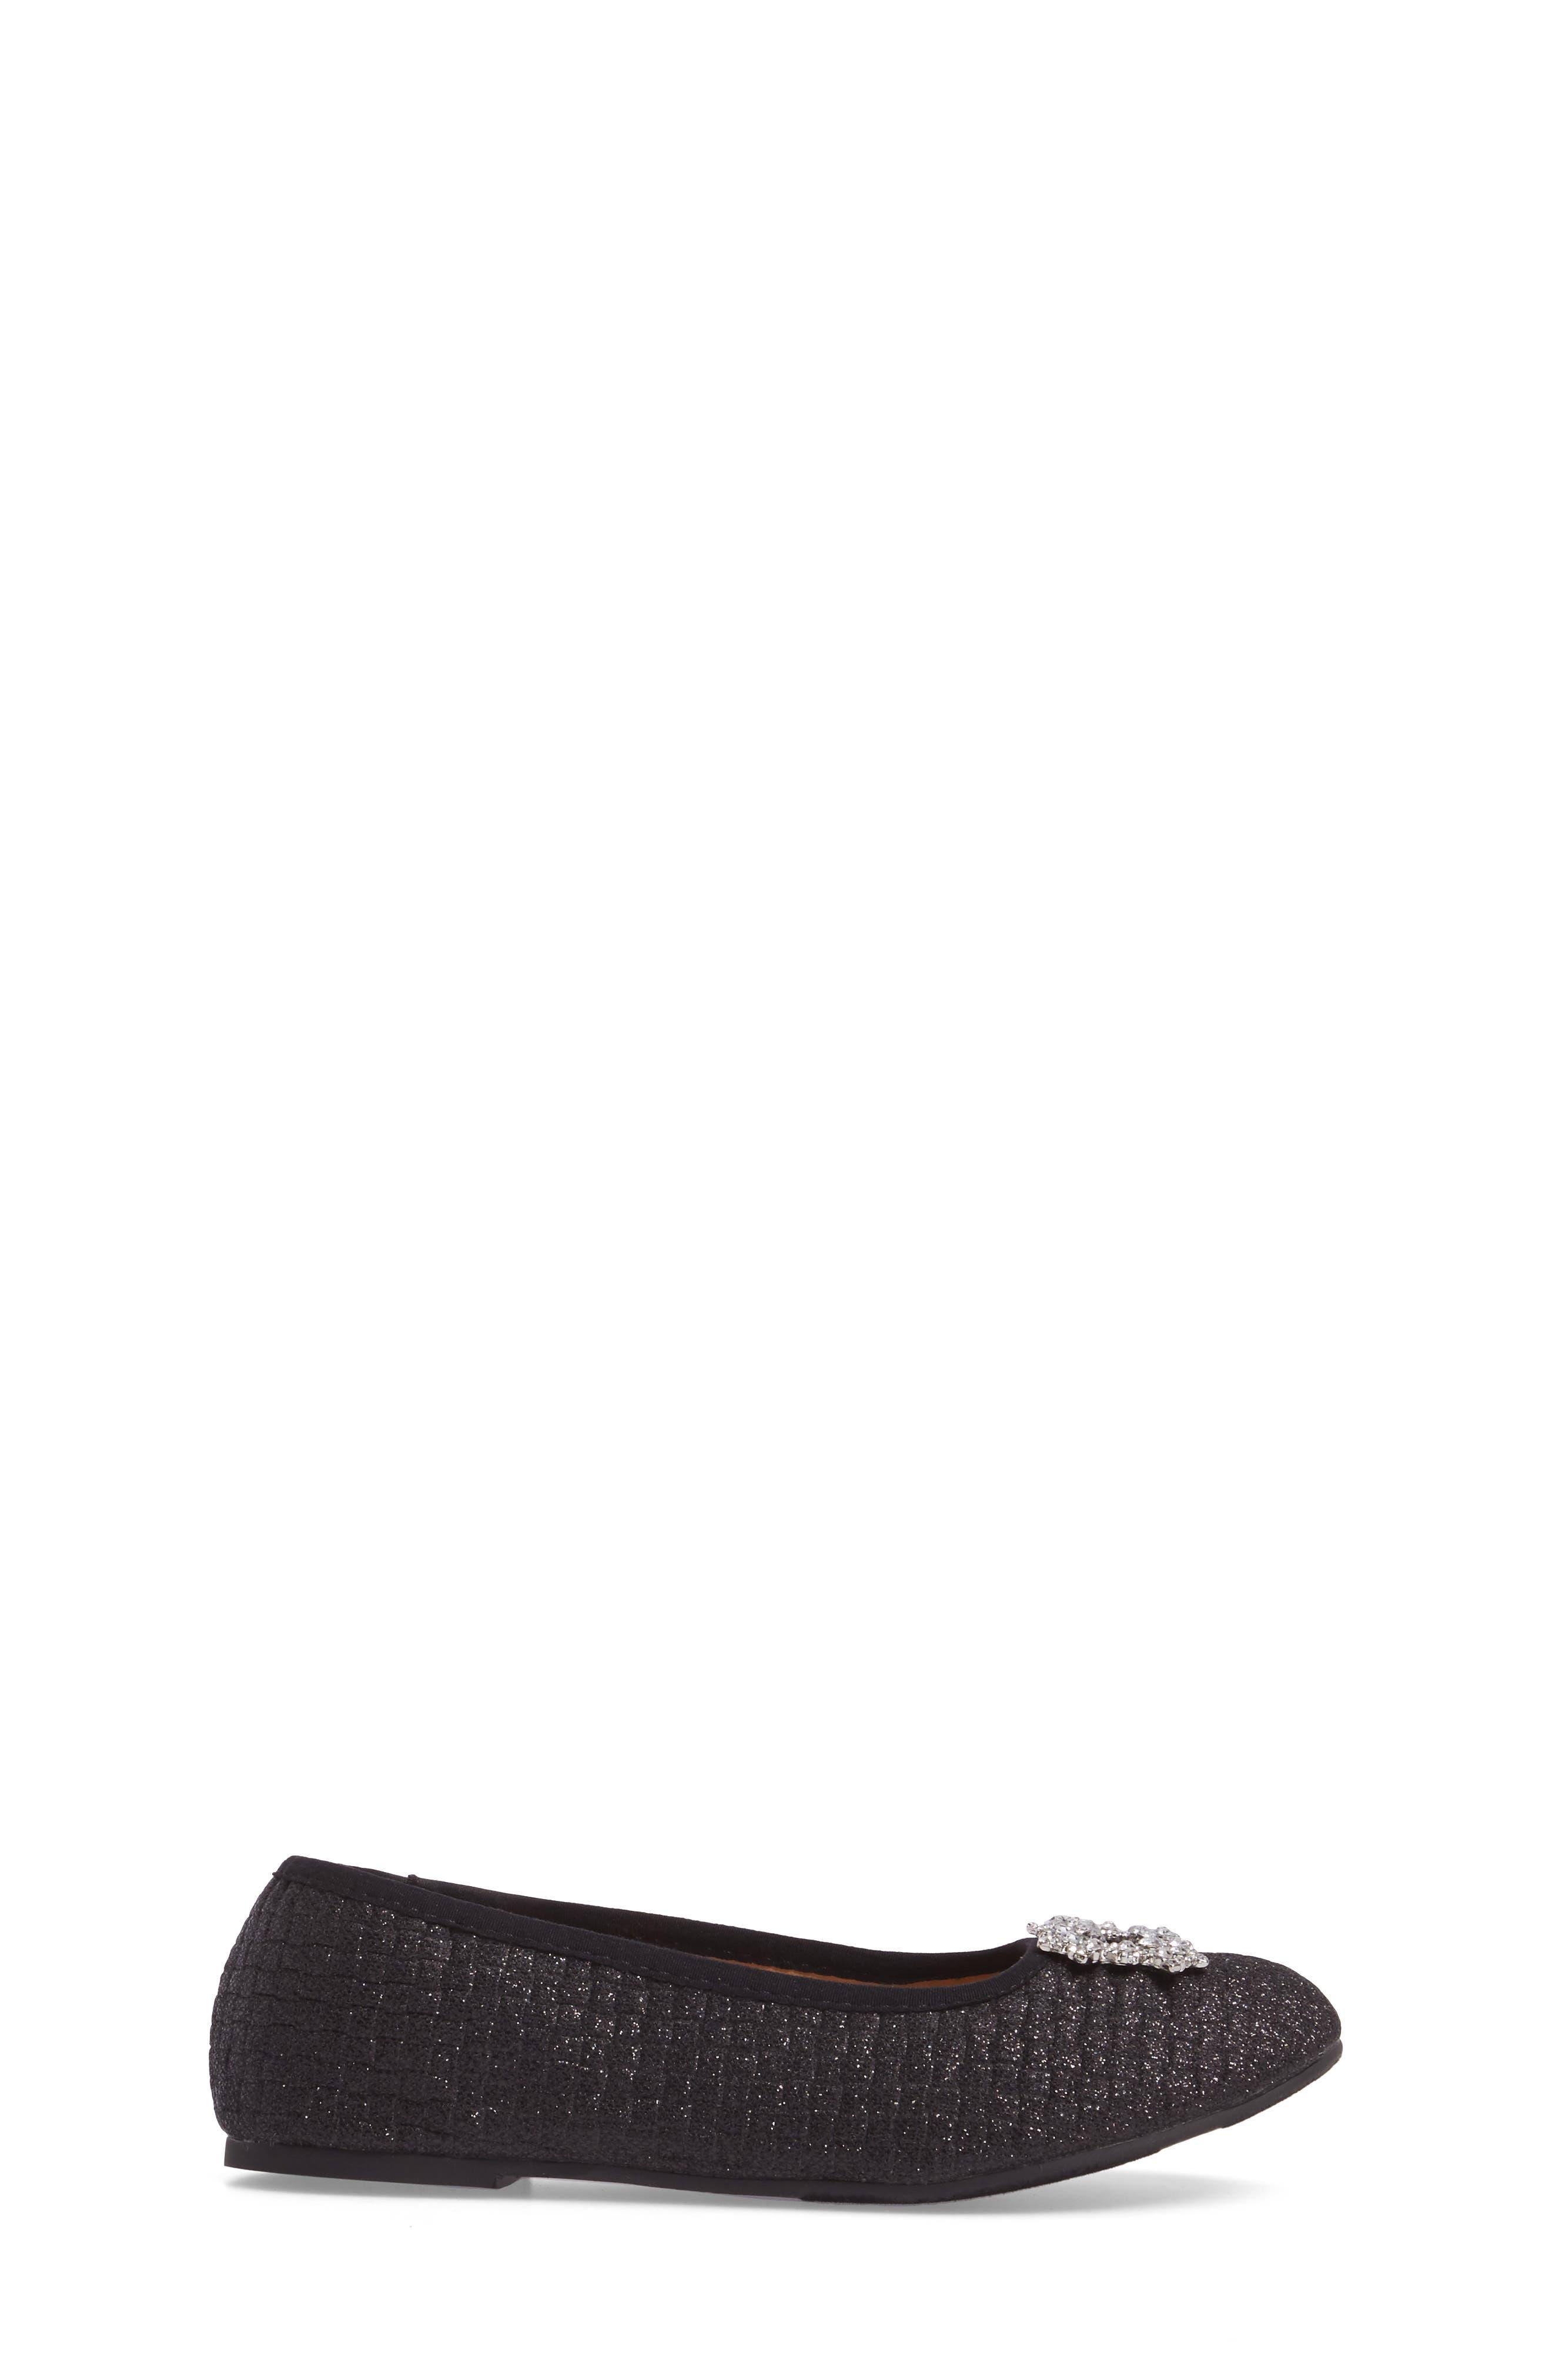 Amber Nidia Embellished Glitter Flat,                             Alternate thumbnail 3, color,                             Black Shimmer